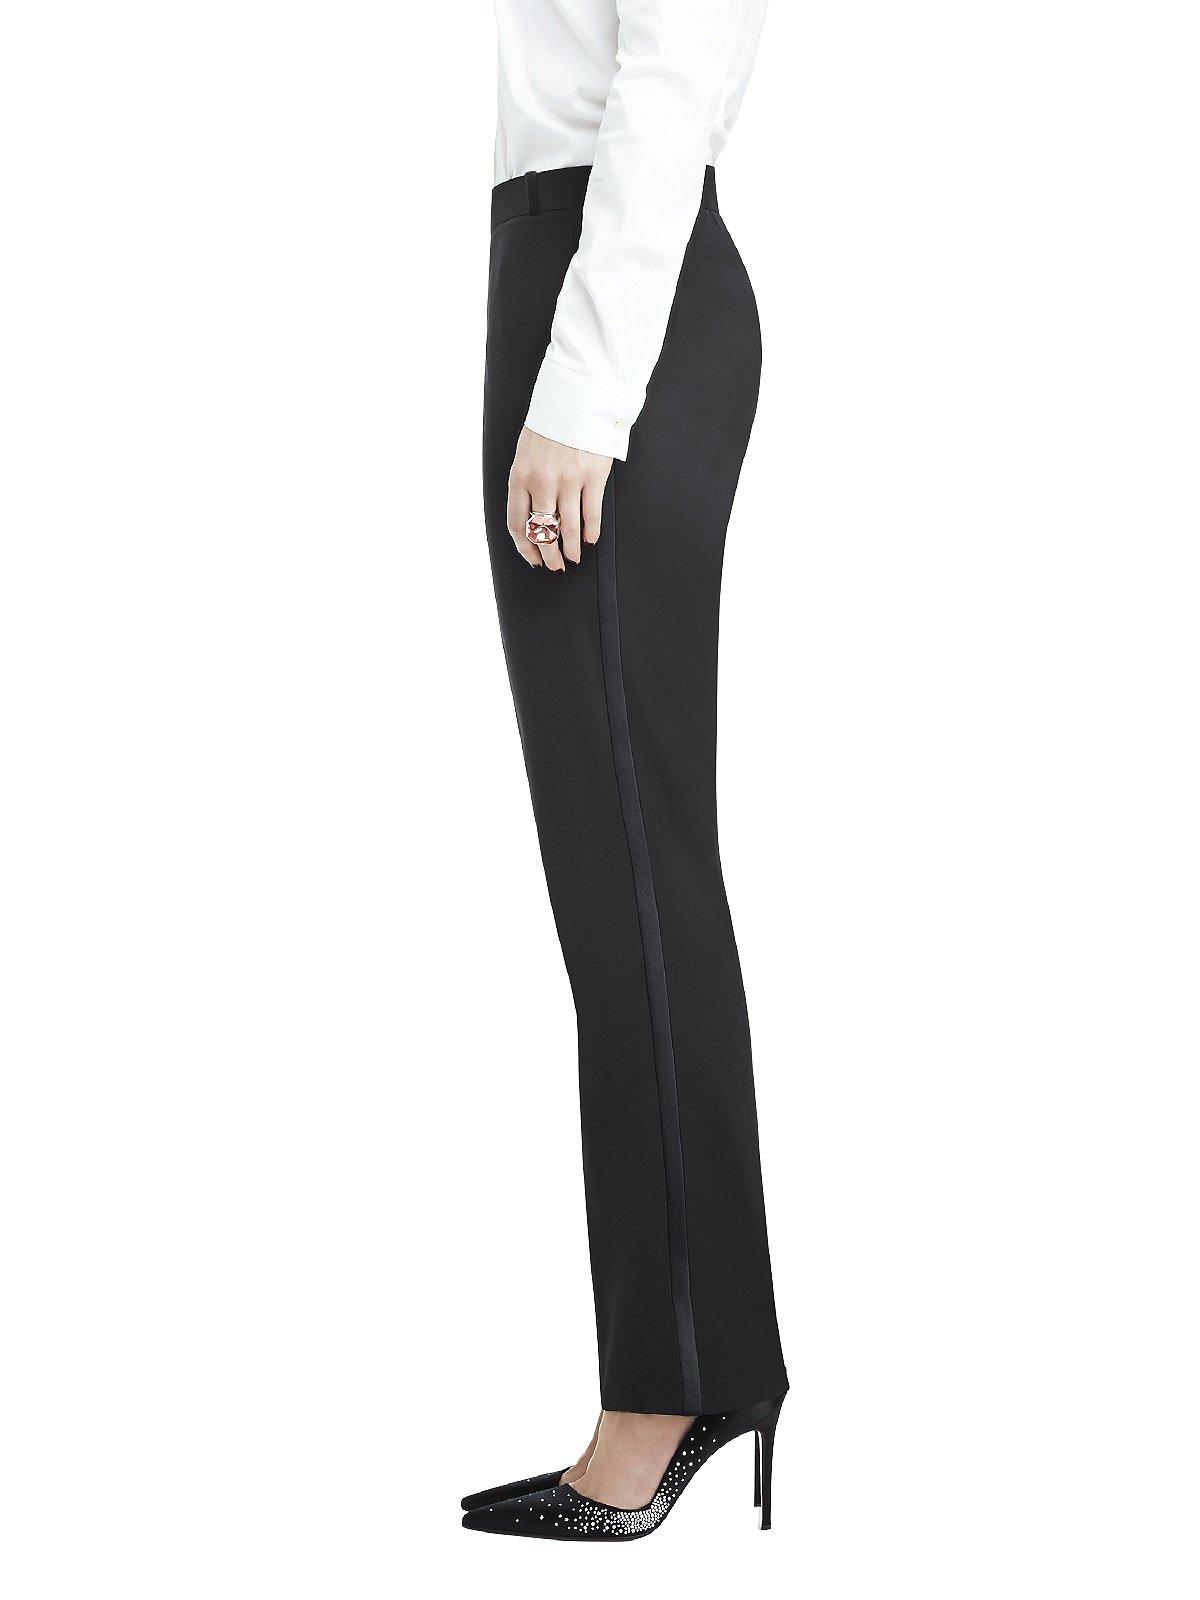 Marlowe Women's Slim Wool Tuxedo Pant with Satin Stripe by Dessy Group - Black - Size 12